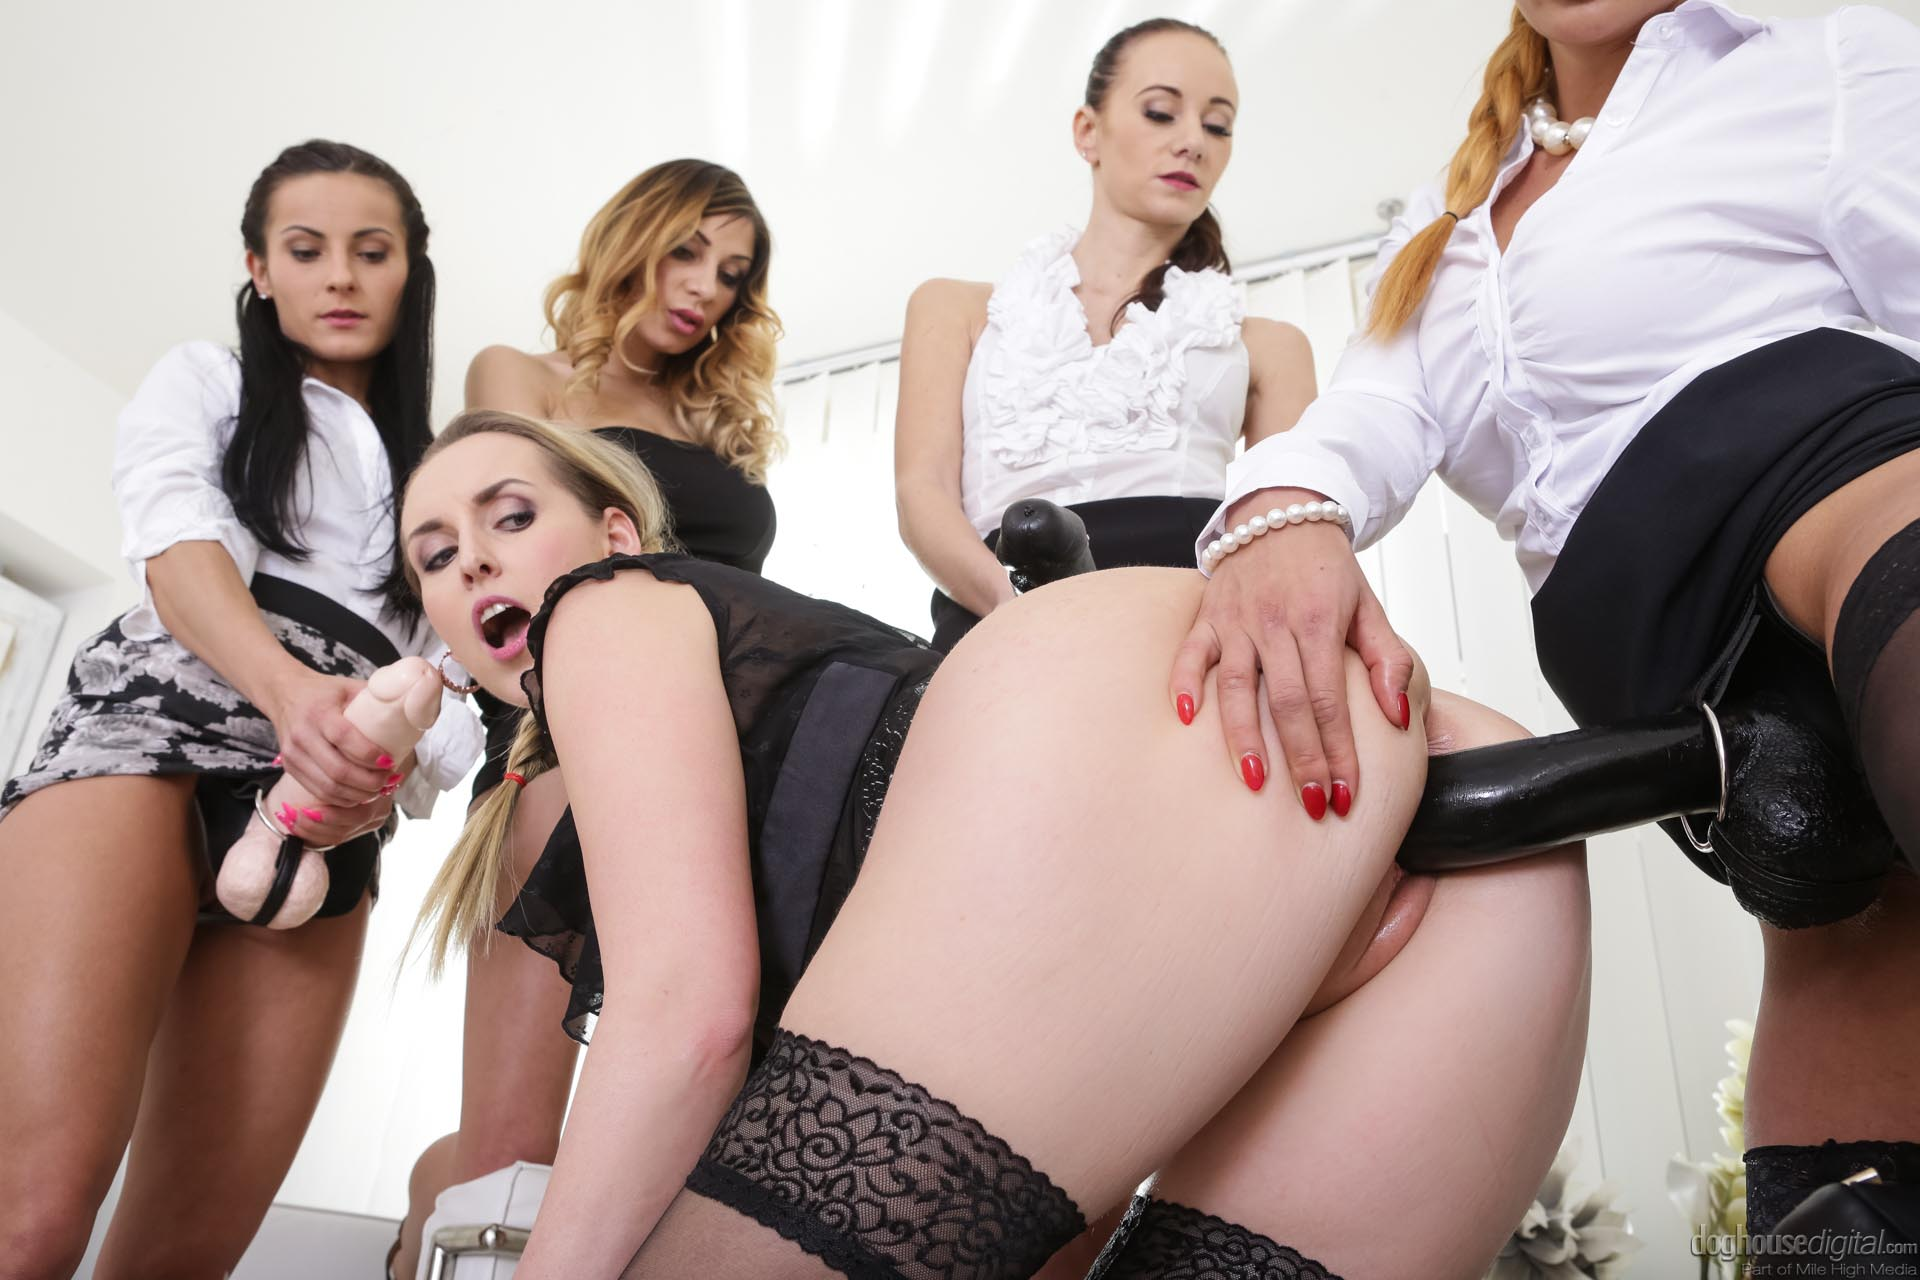 Rough lesbian mistress peeing